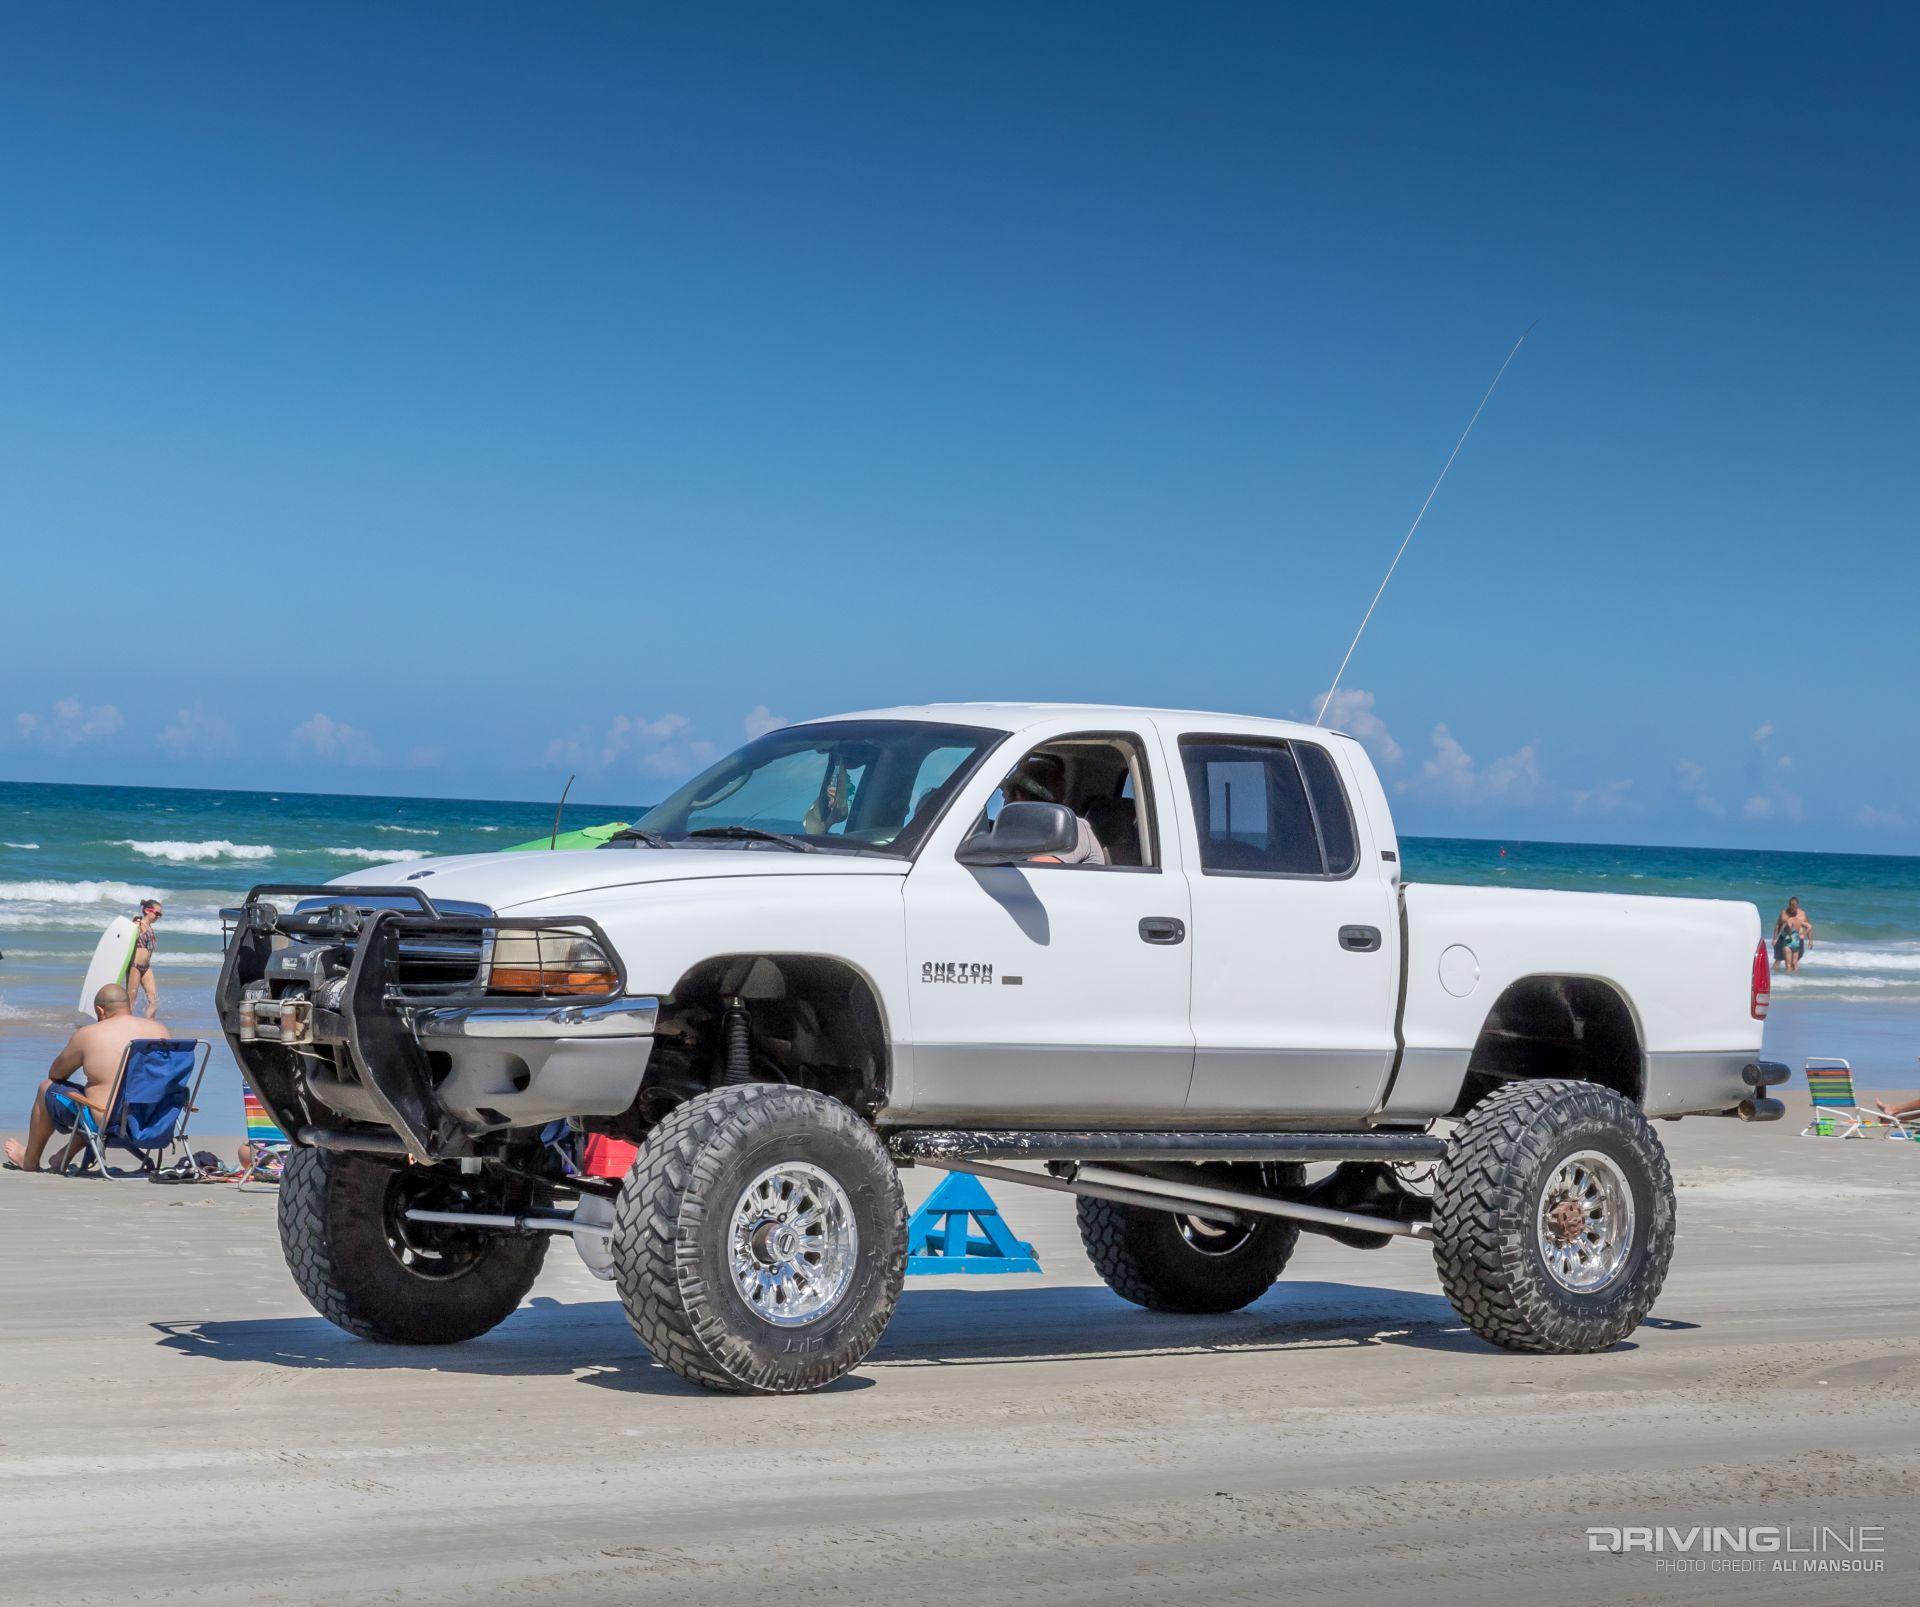 Battle of the Bling: The 2017 Daytona Truck Meet | DrivingLine